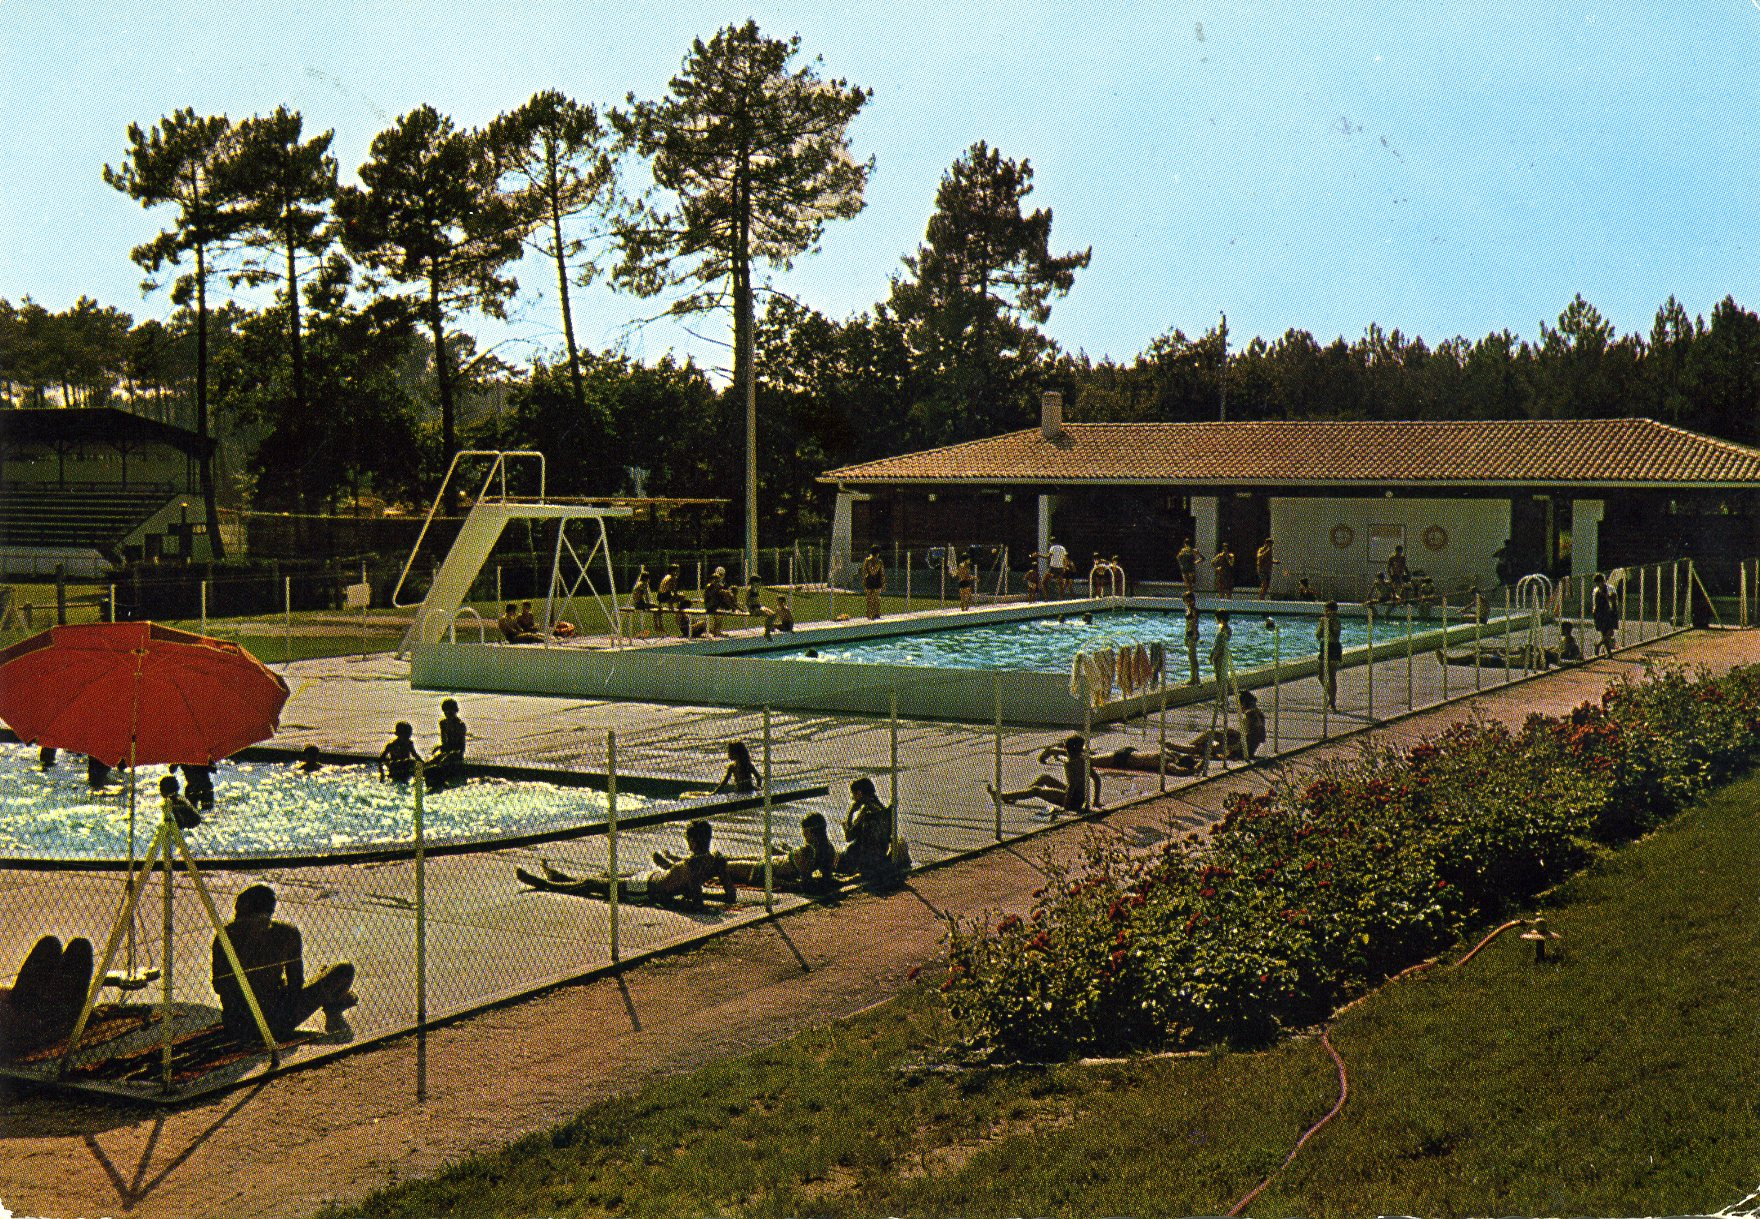 Photo salles 33770 la piscine municipale carte for Piscine a salles